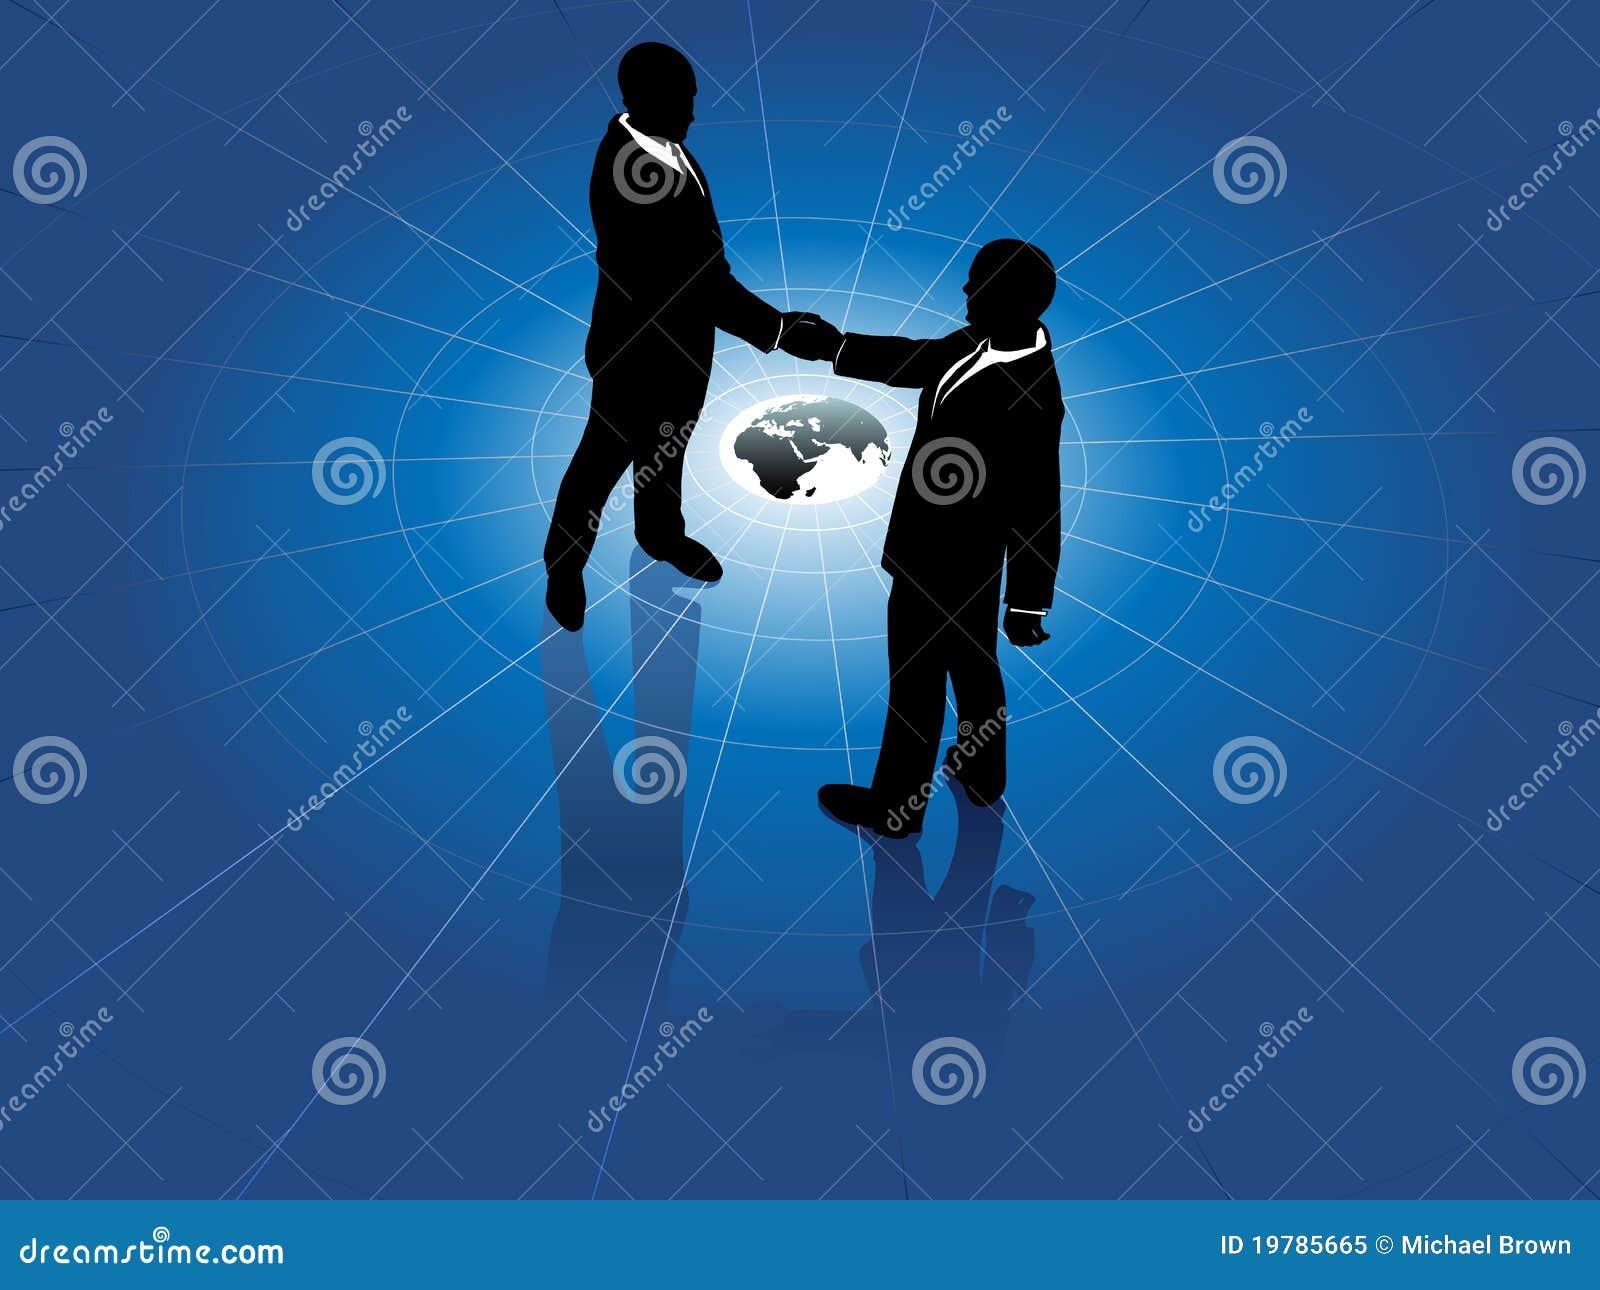 global business men handshake world agreement royalty free stock photo